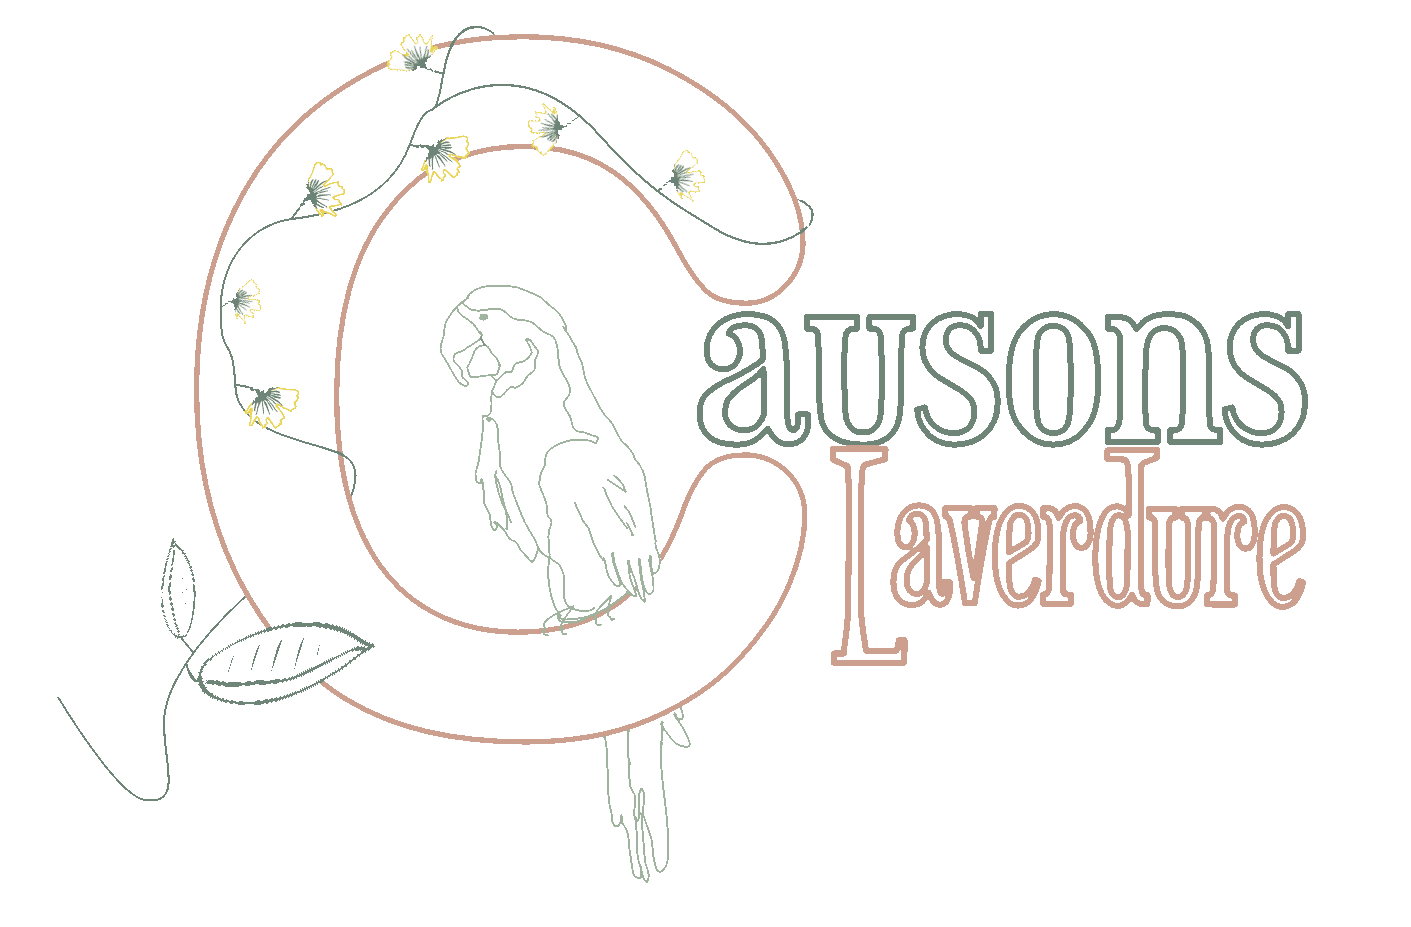 Logo Causons Laverdure éco+